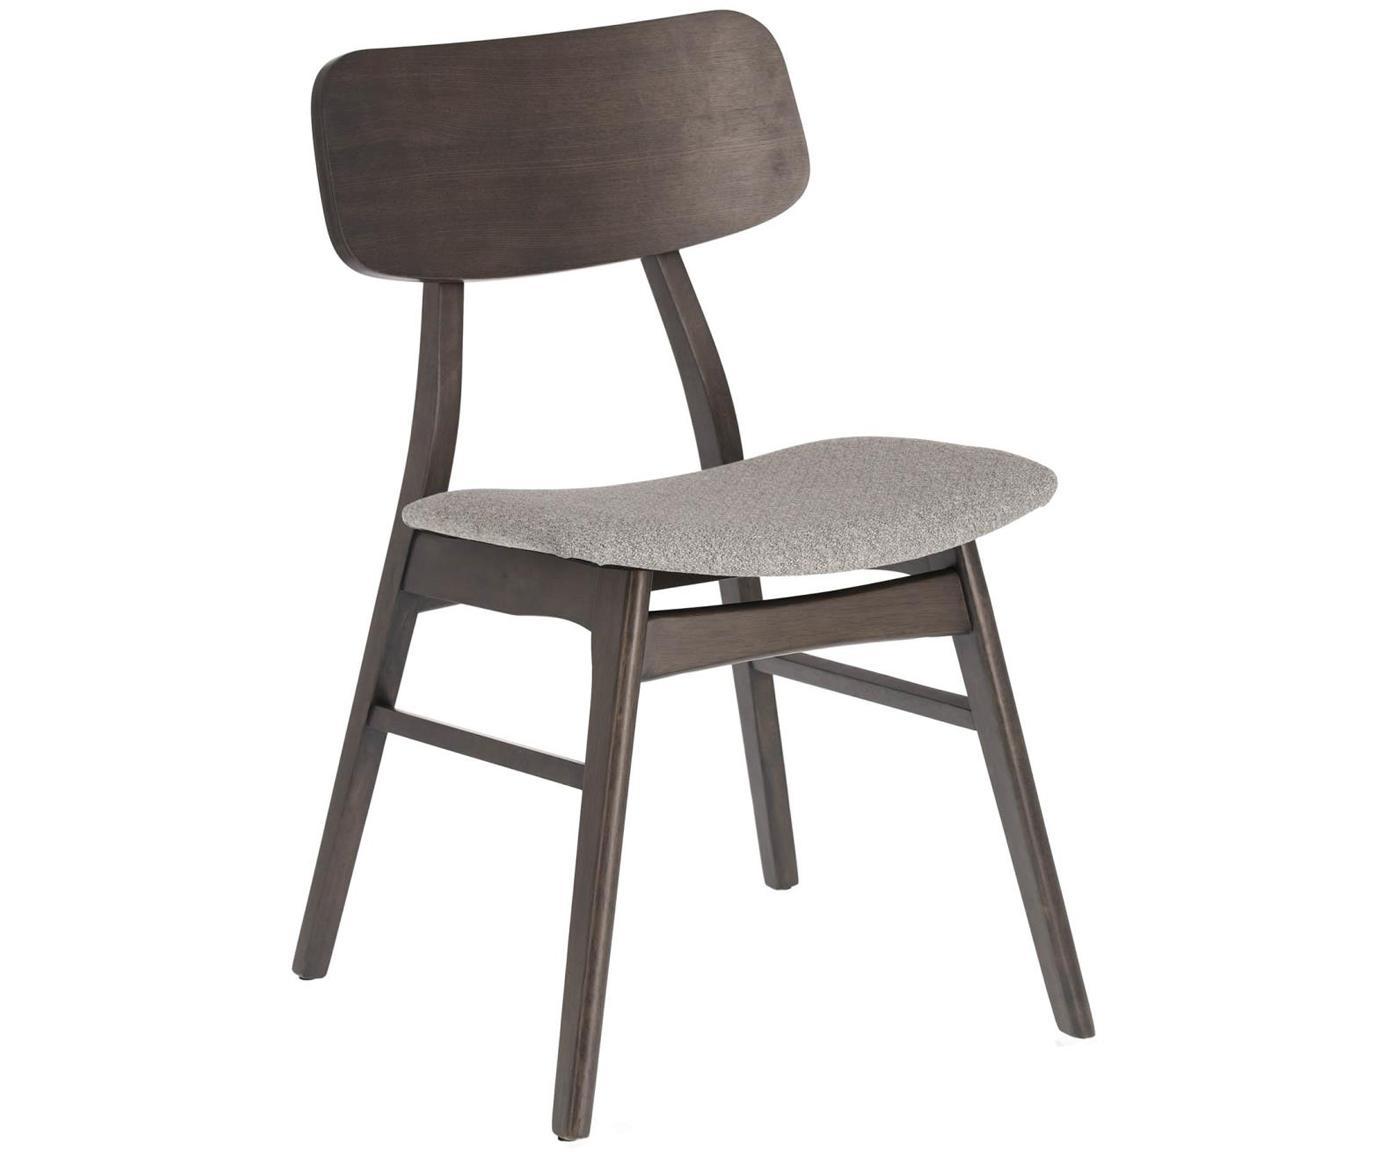 Holzstühle Selia, 2 Stück, Gestell: Massives Gummibaumholz, E, Bezug: Polyester, Grautöne, 48 x 79 cm